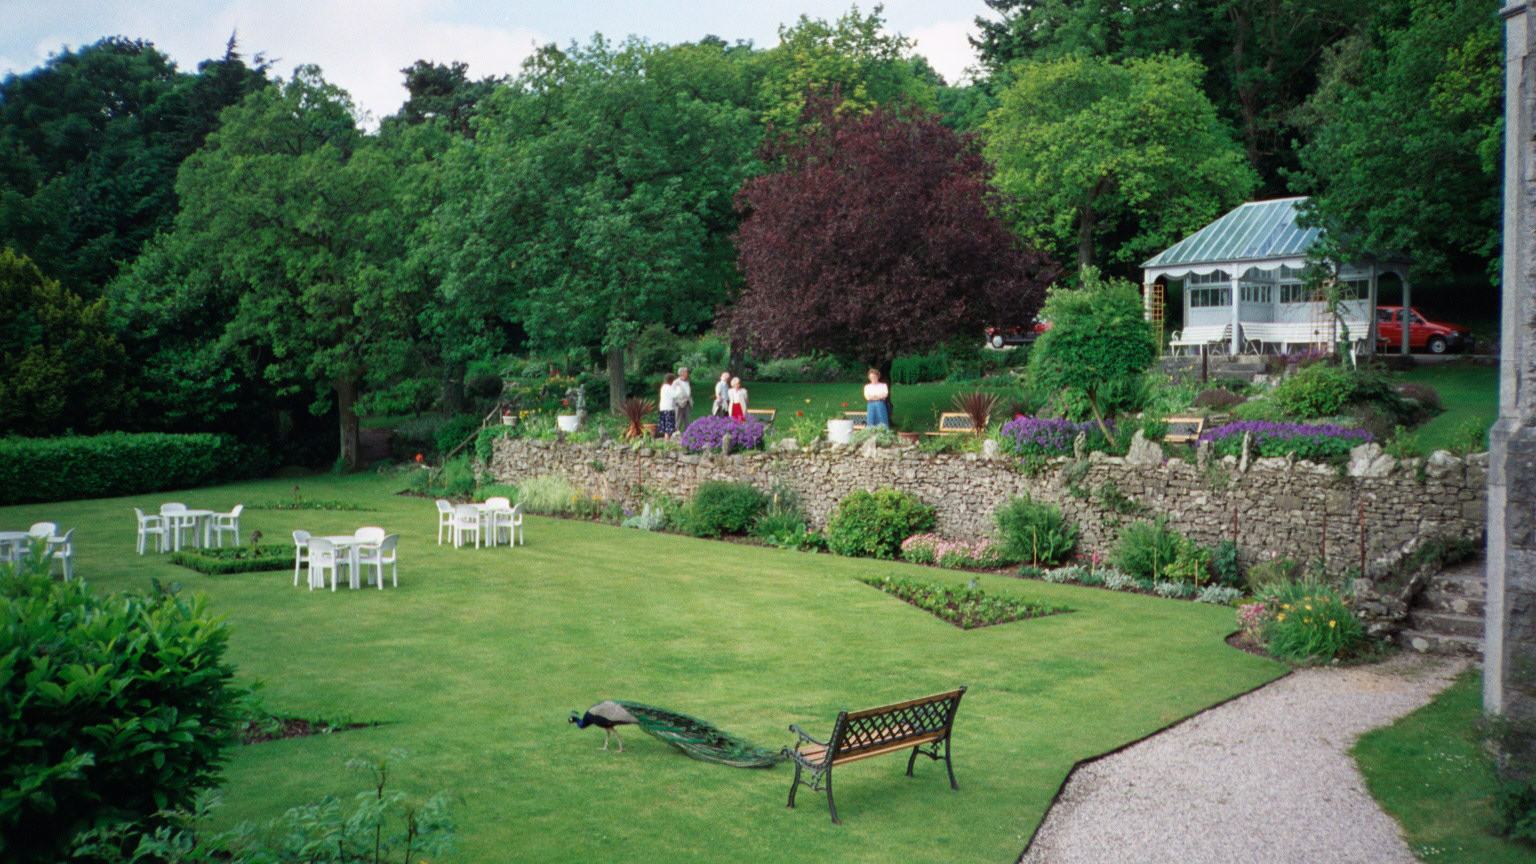 cumbria-grand-hotel-garden-grange-over-sands-england